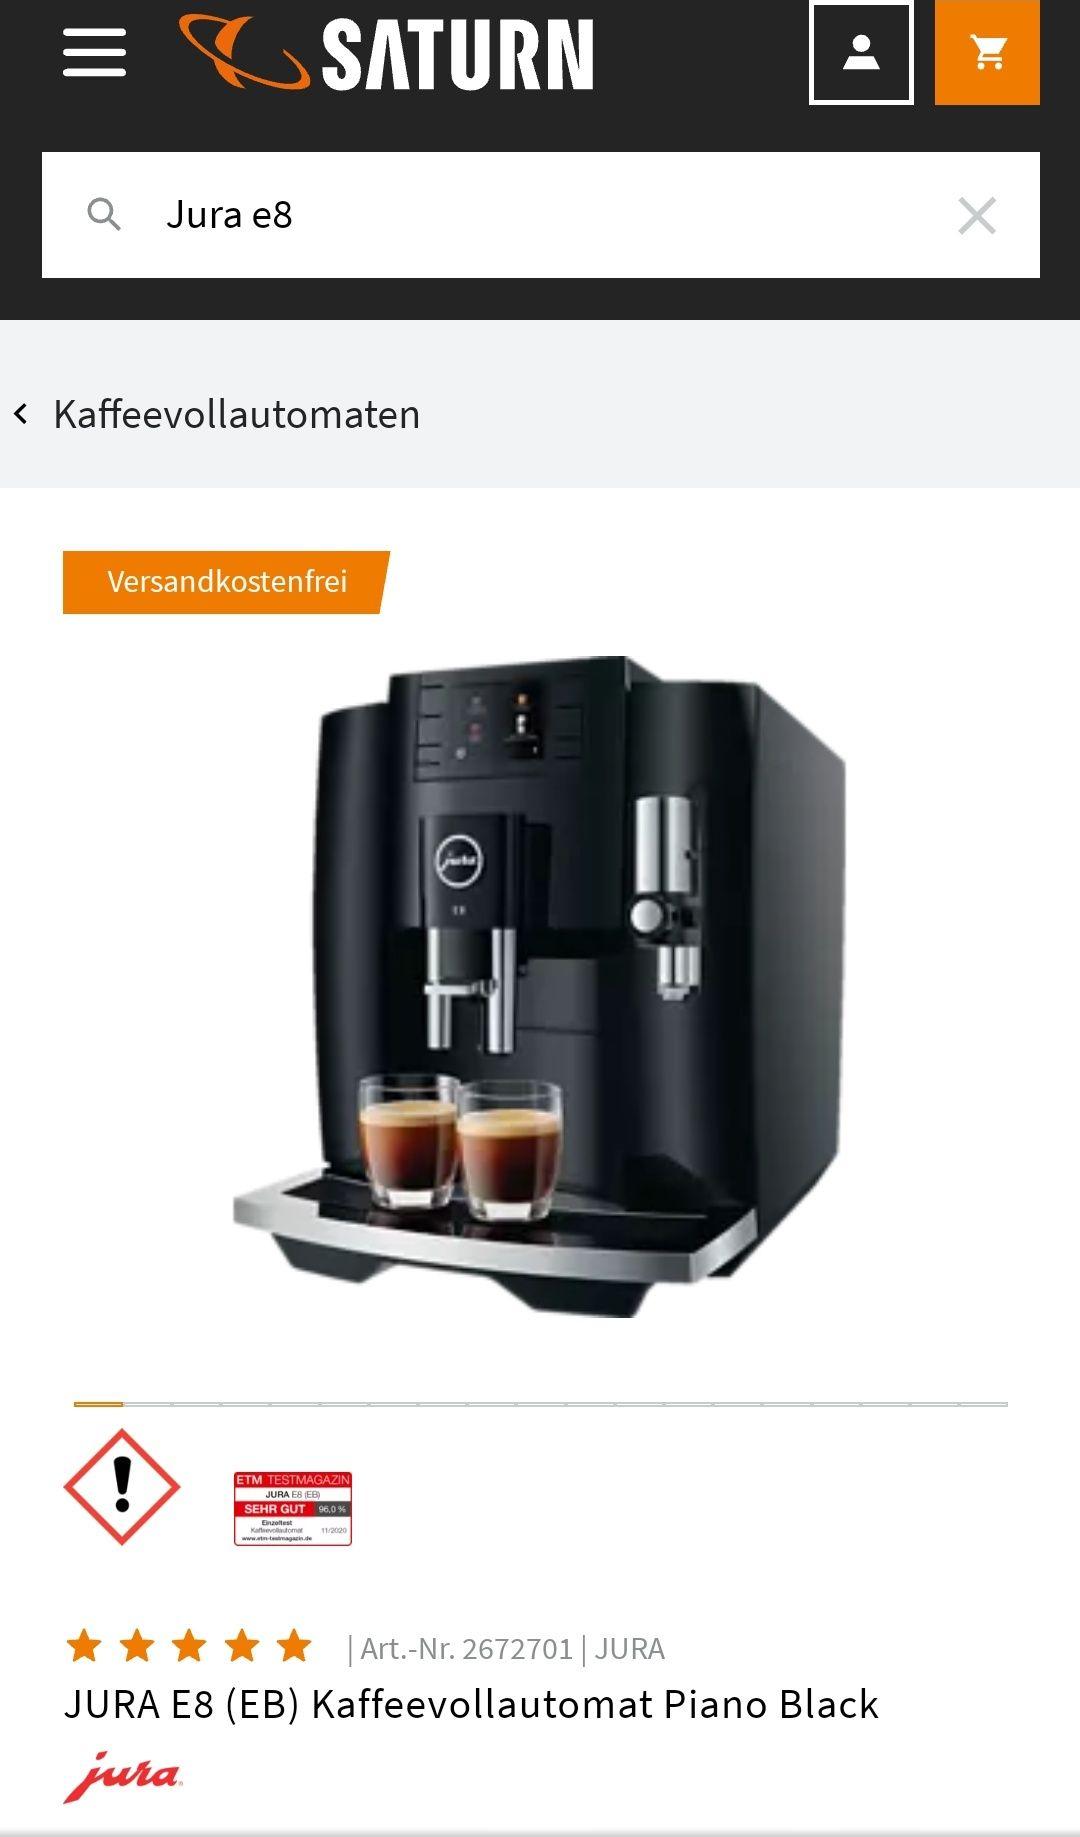 JURA Kaffee-Vollautomat E8 (EB) Piano Black